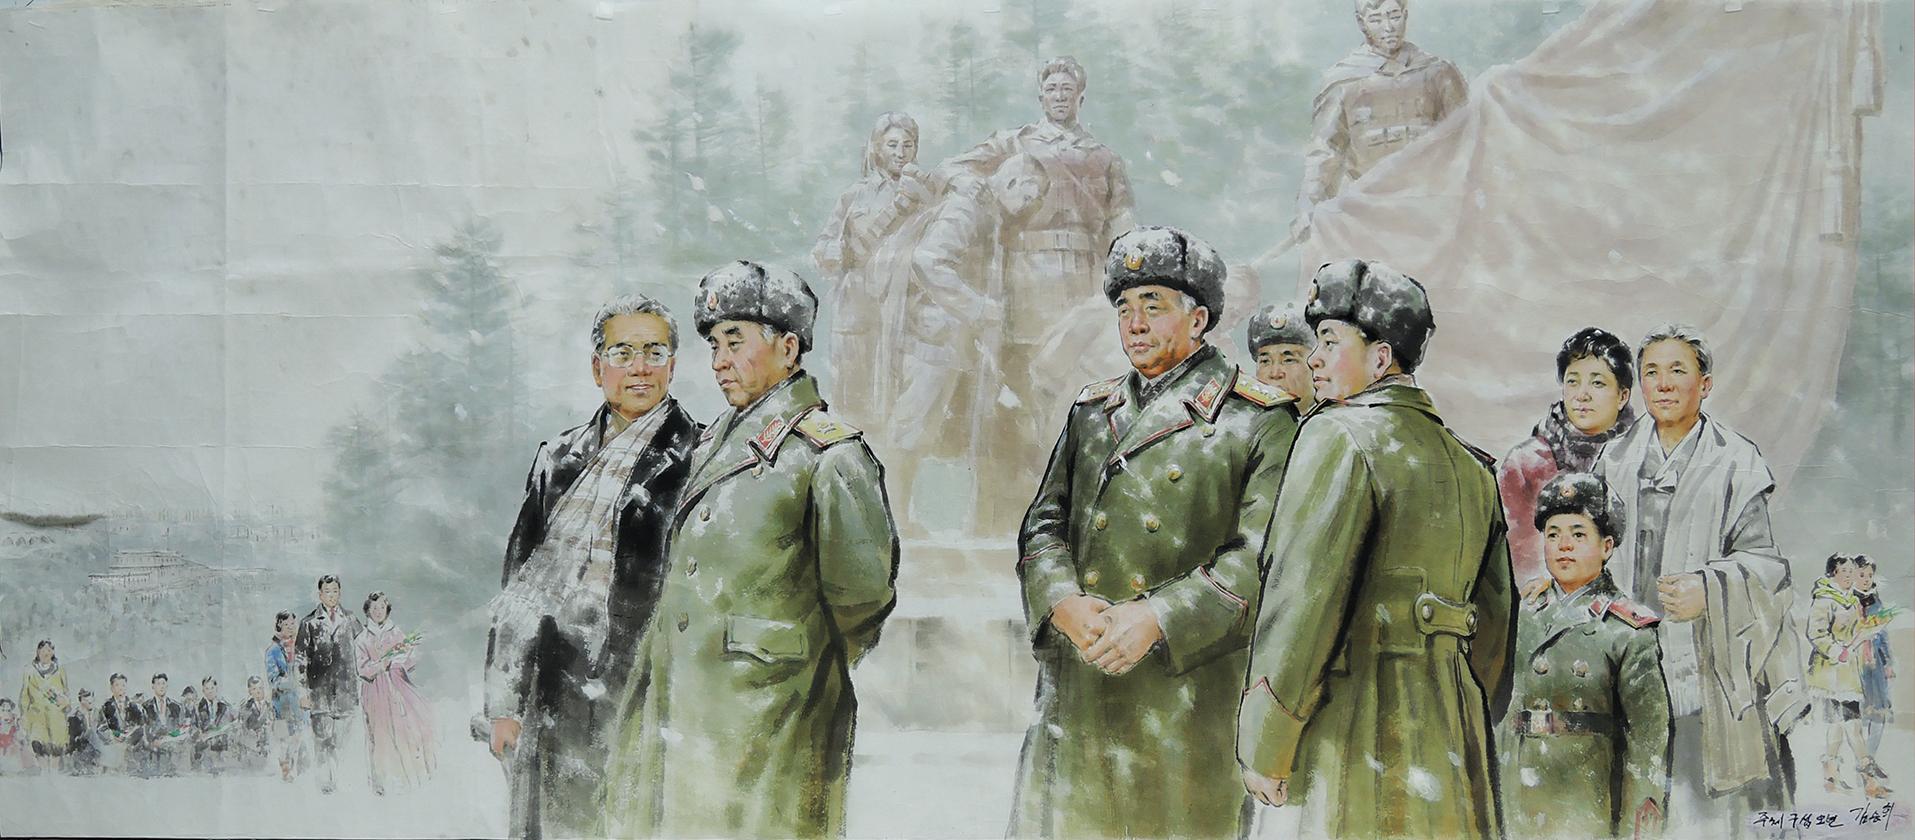 """Remembrance"" by Jang Kil-Nam | BG Muhn."